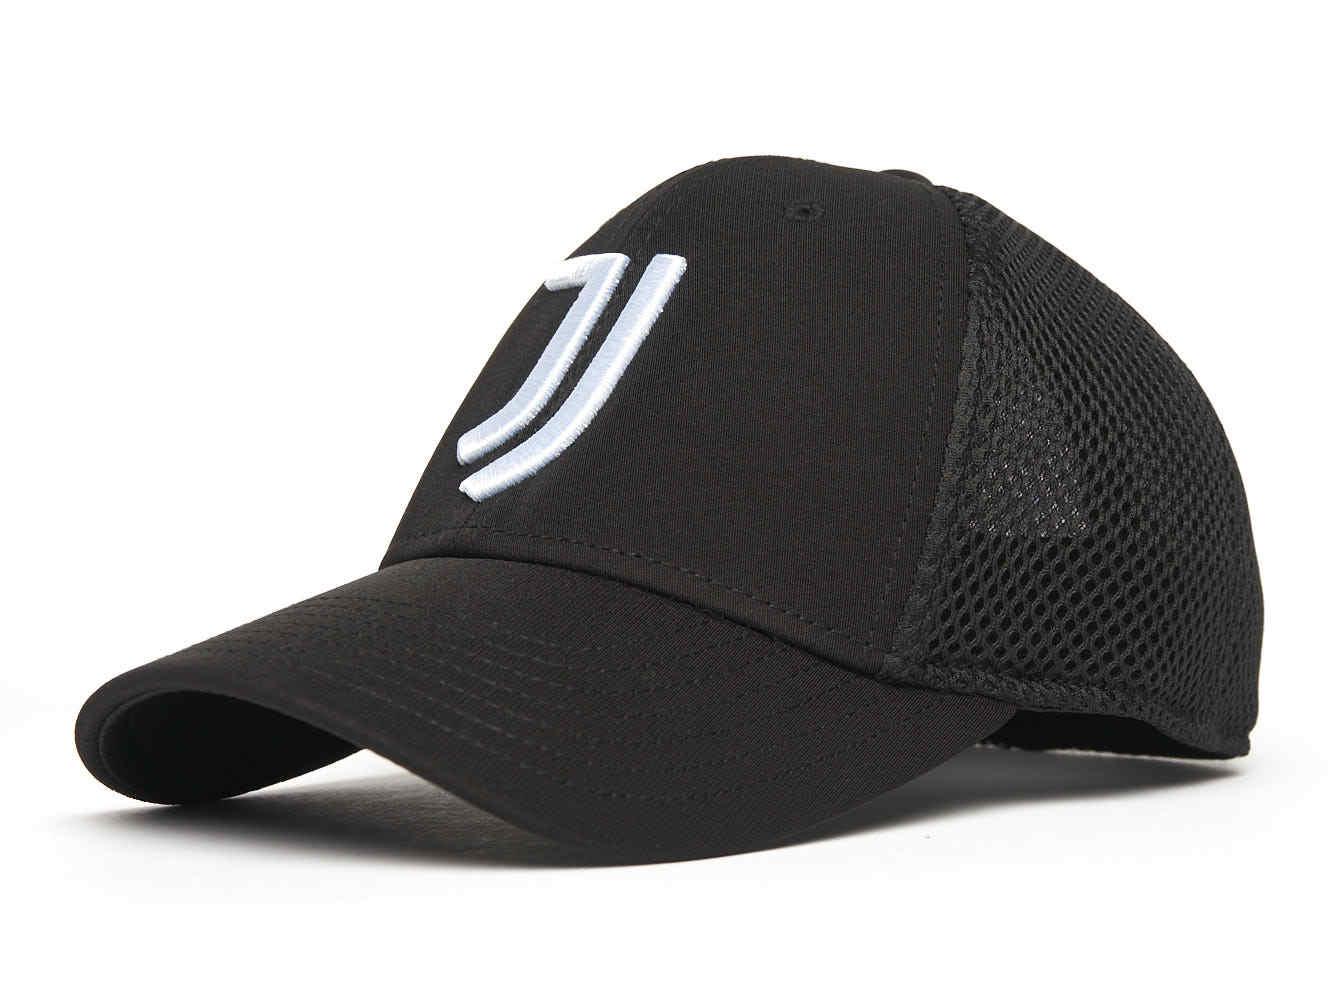 Бейсболка Ювентус № 10 (размер S)